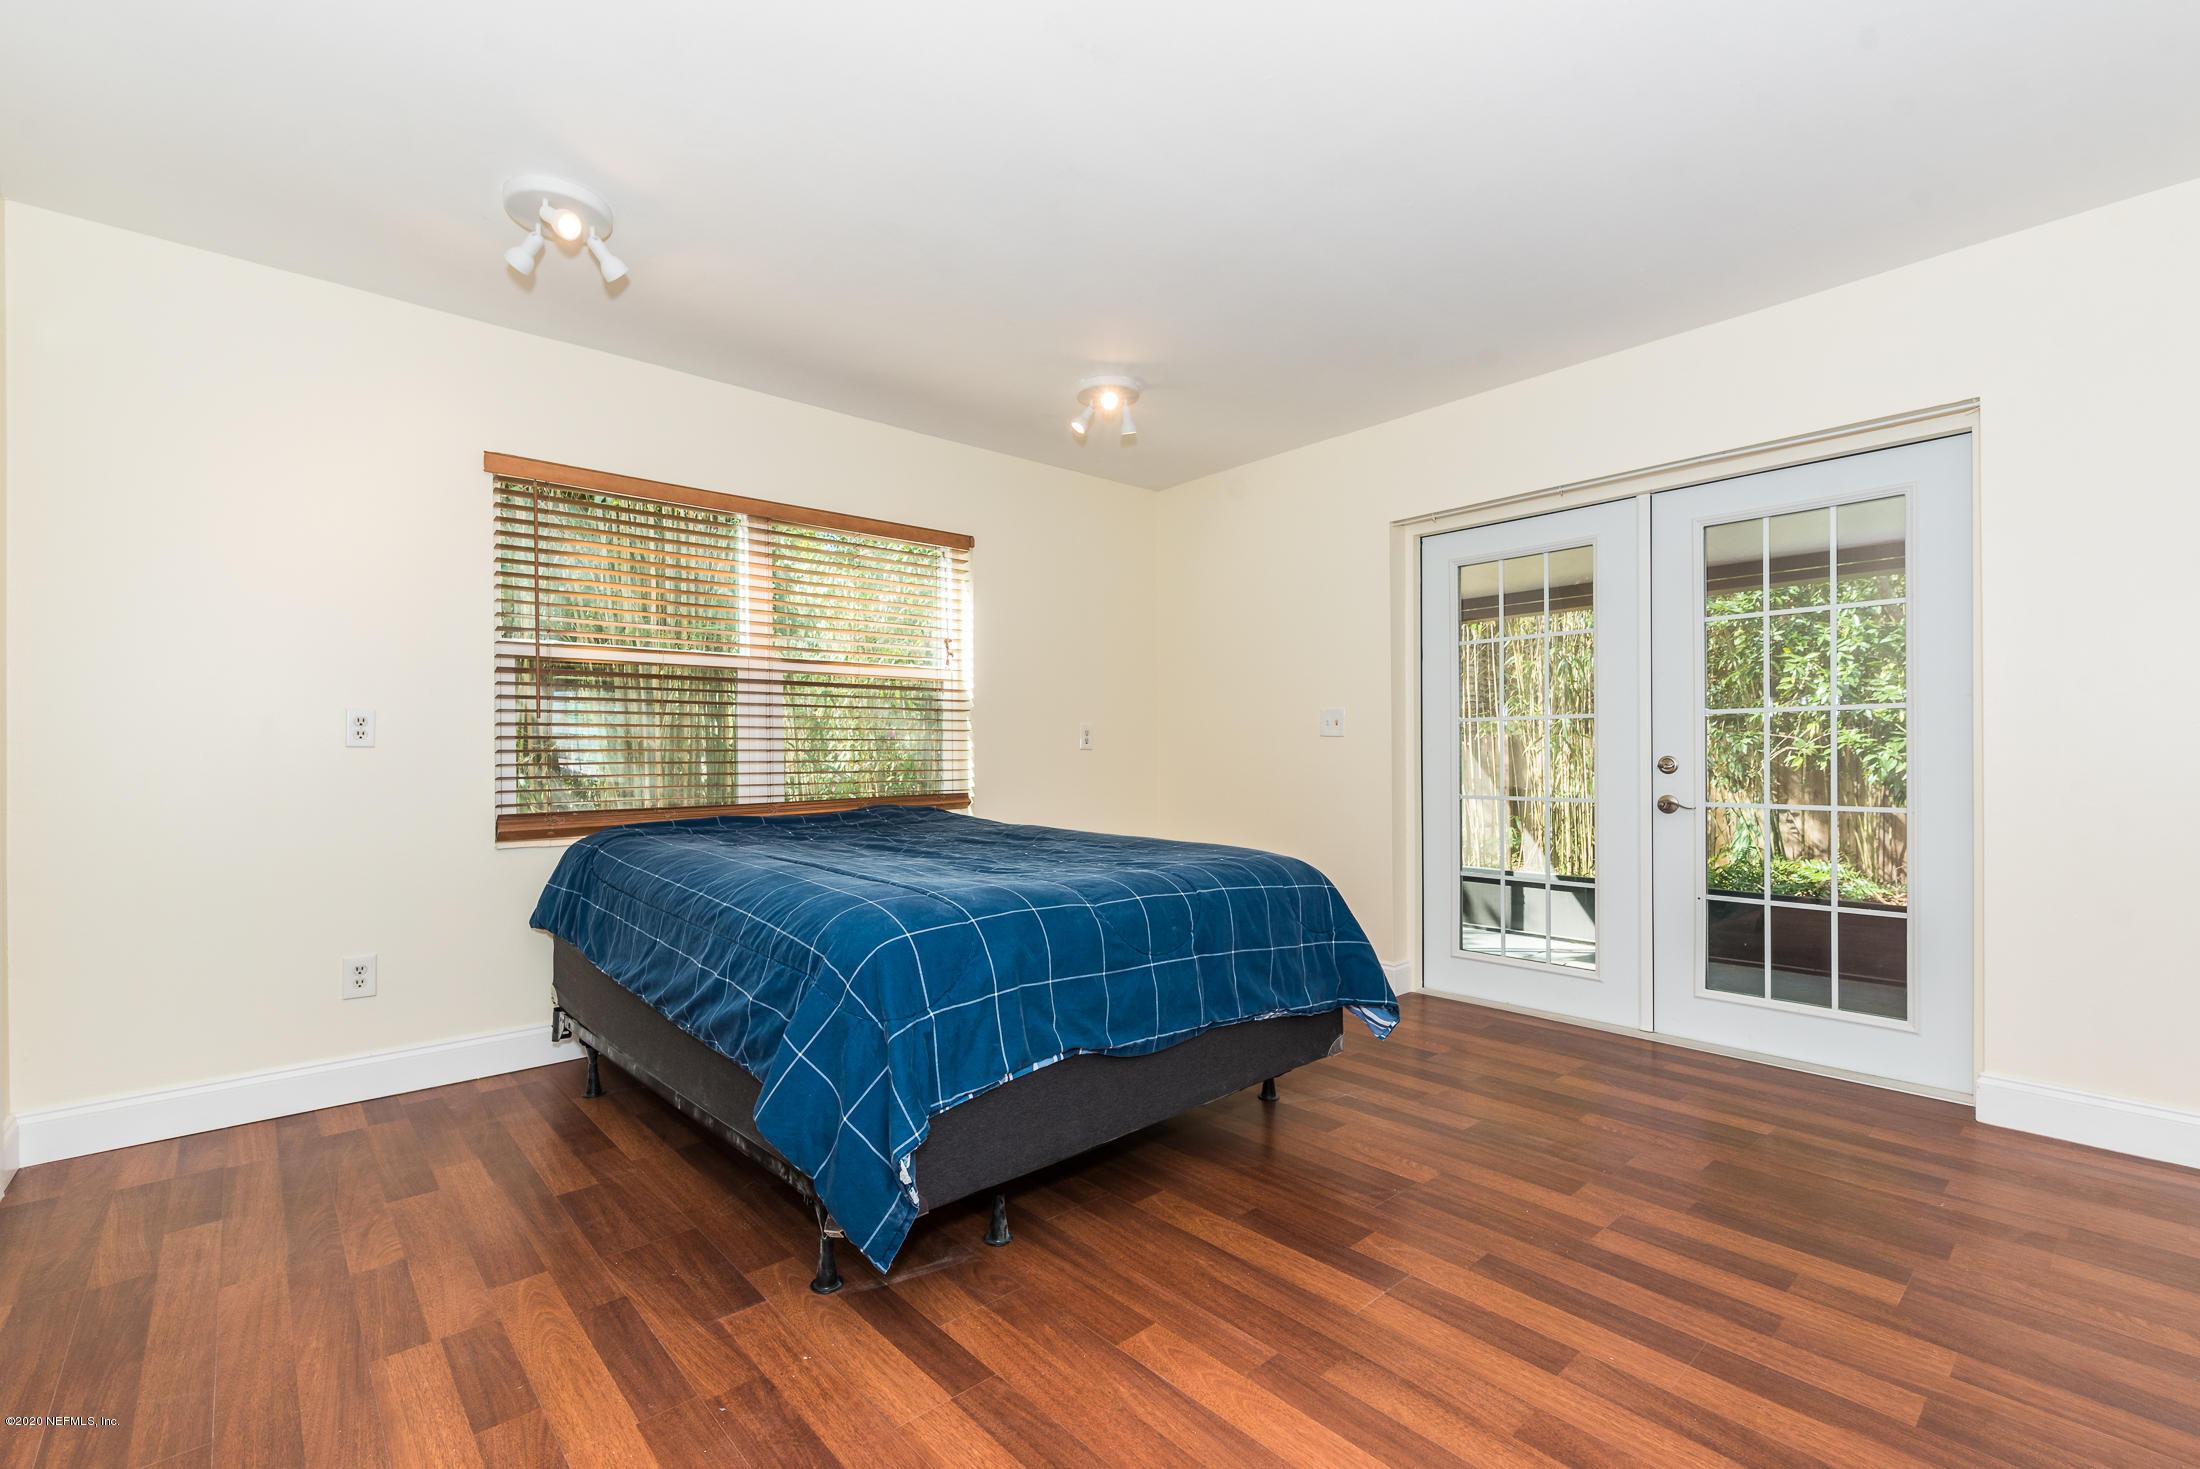 817 VALNERA, ST AUGUSTINE, FLORIDA 32086, 2 Bedrooms Bedrooms, ,2 BathroomsBathrooms,Residential,For sale,VALNERA,1044123